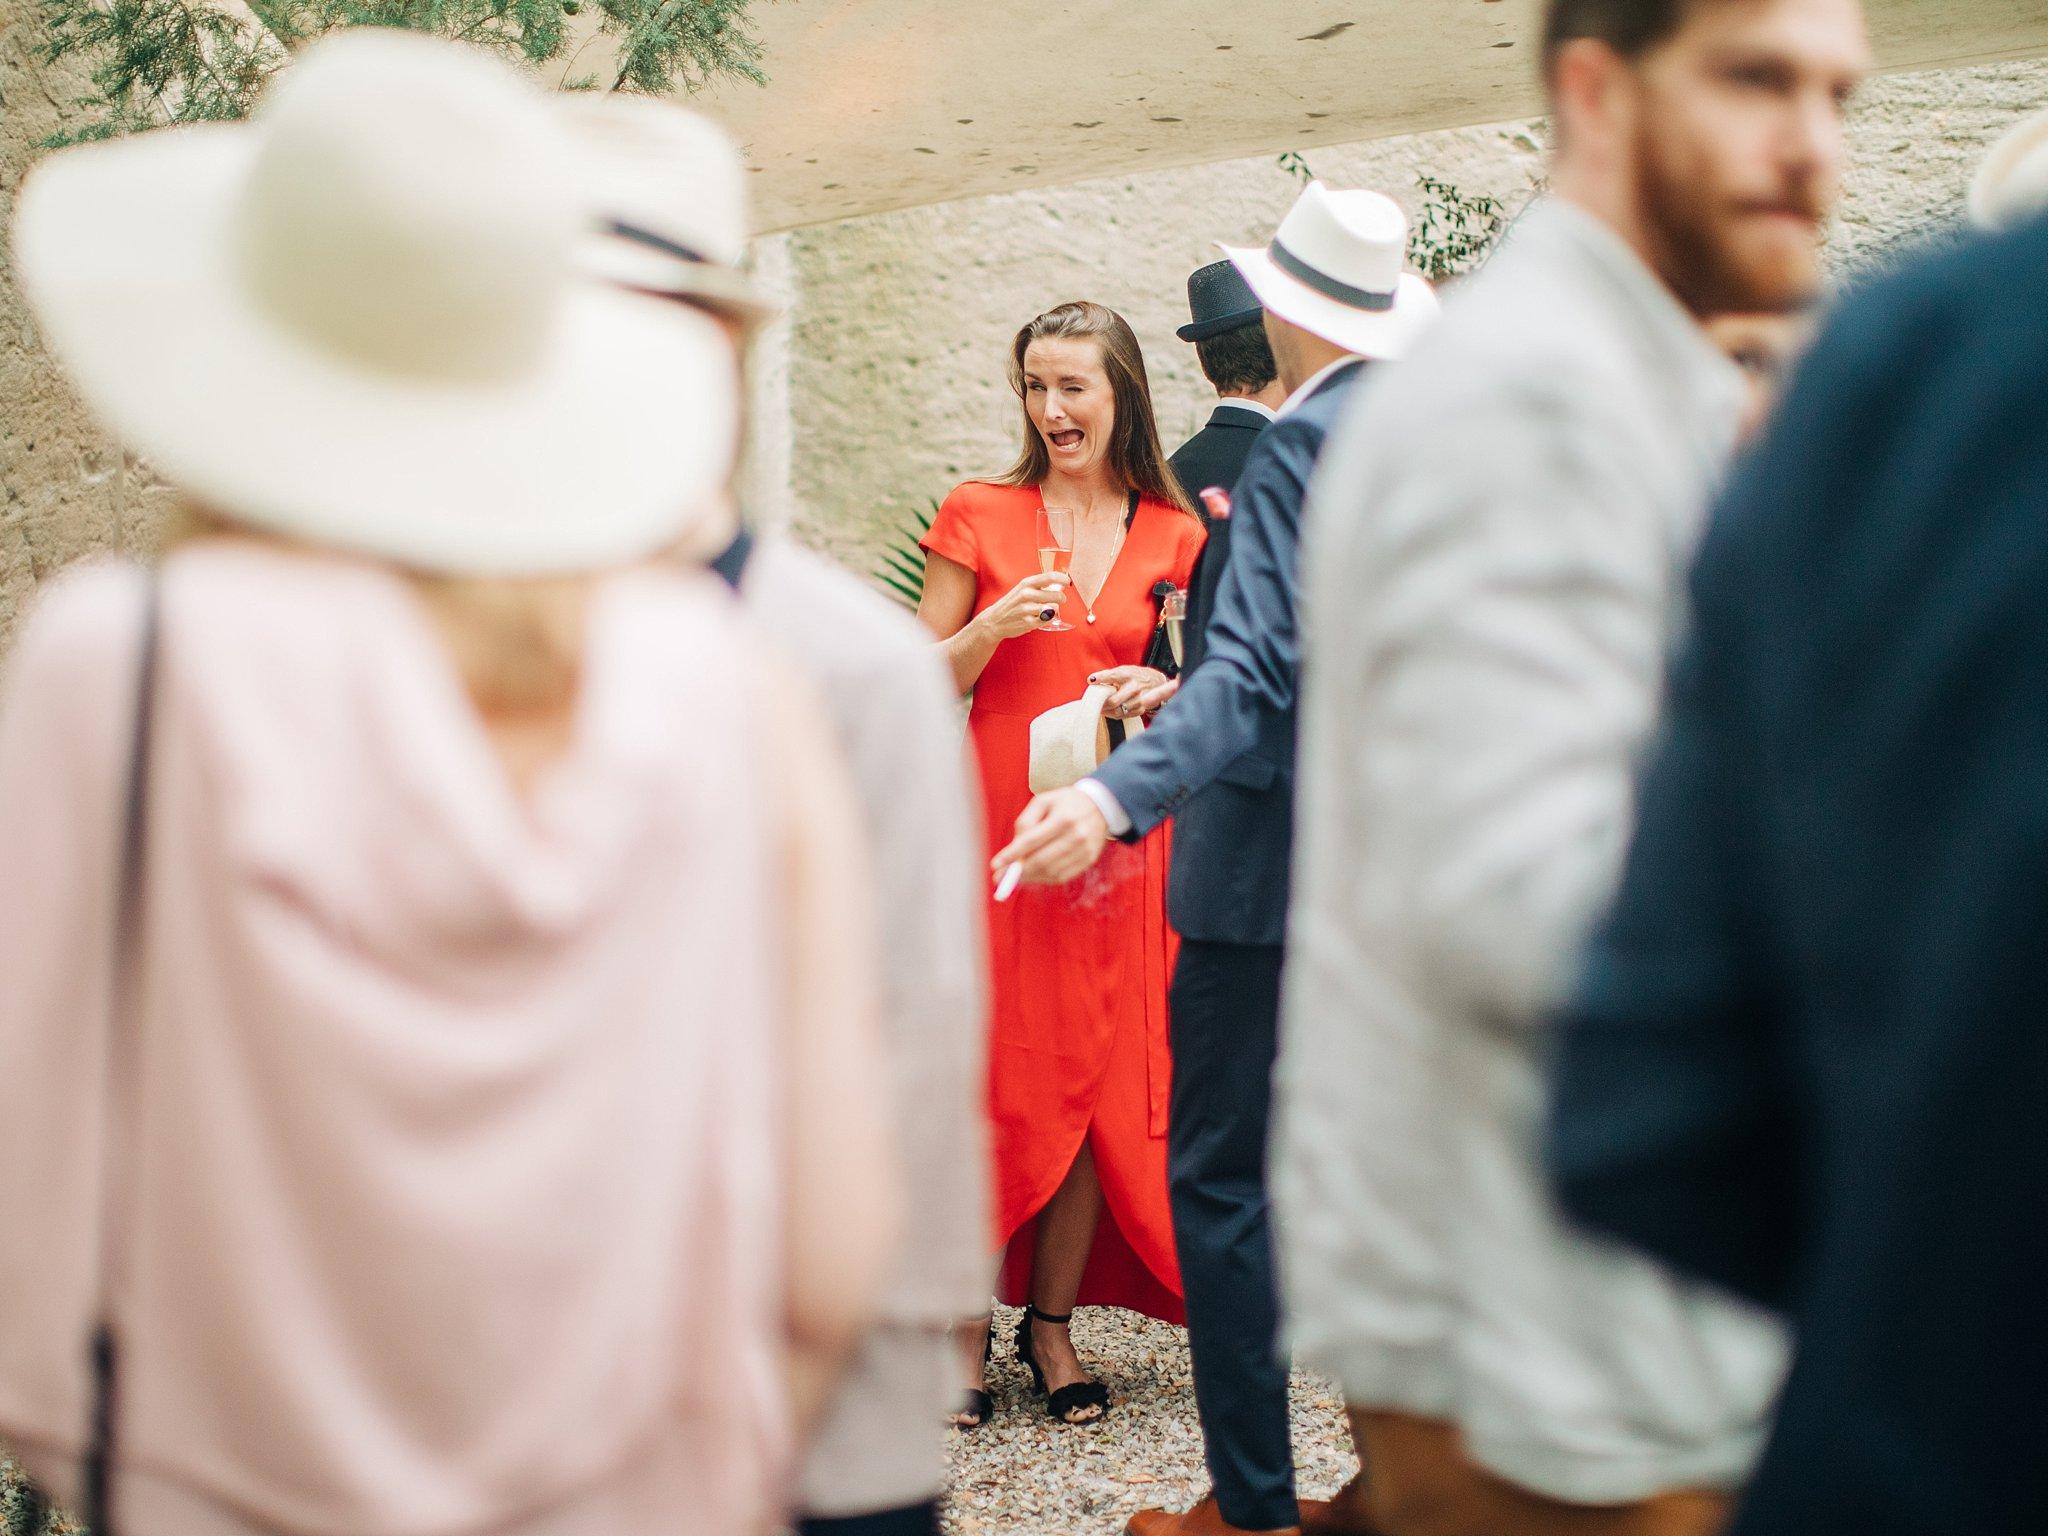 Wedding Photographer Perpignan - Château Las Collas Wedding - Hugo Hennequin066.jpg